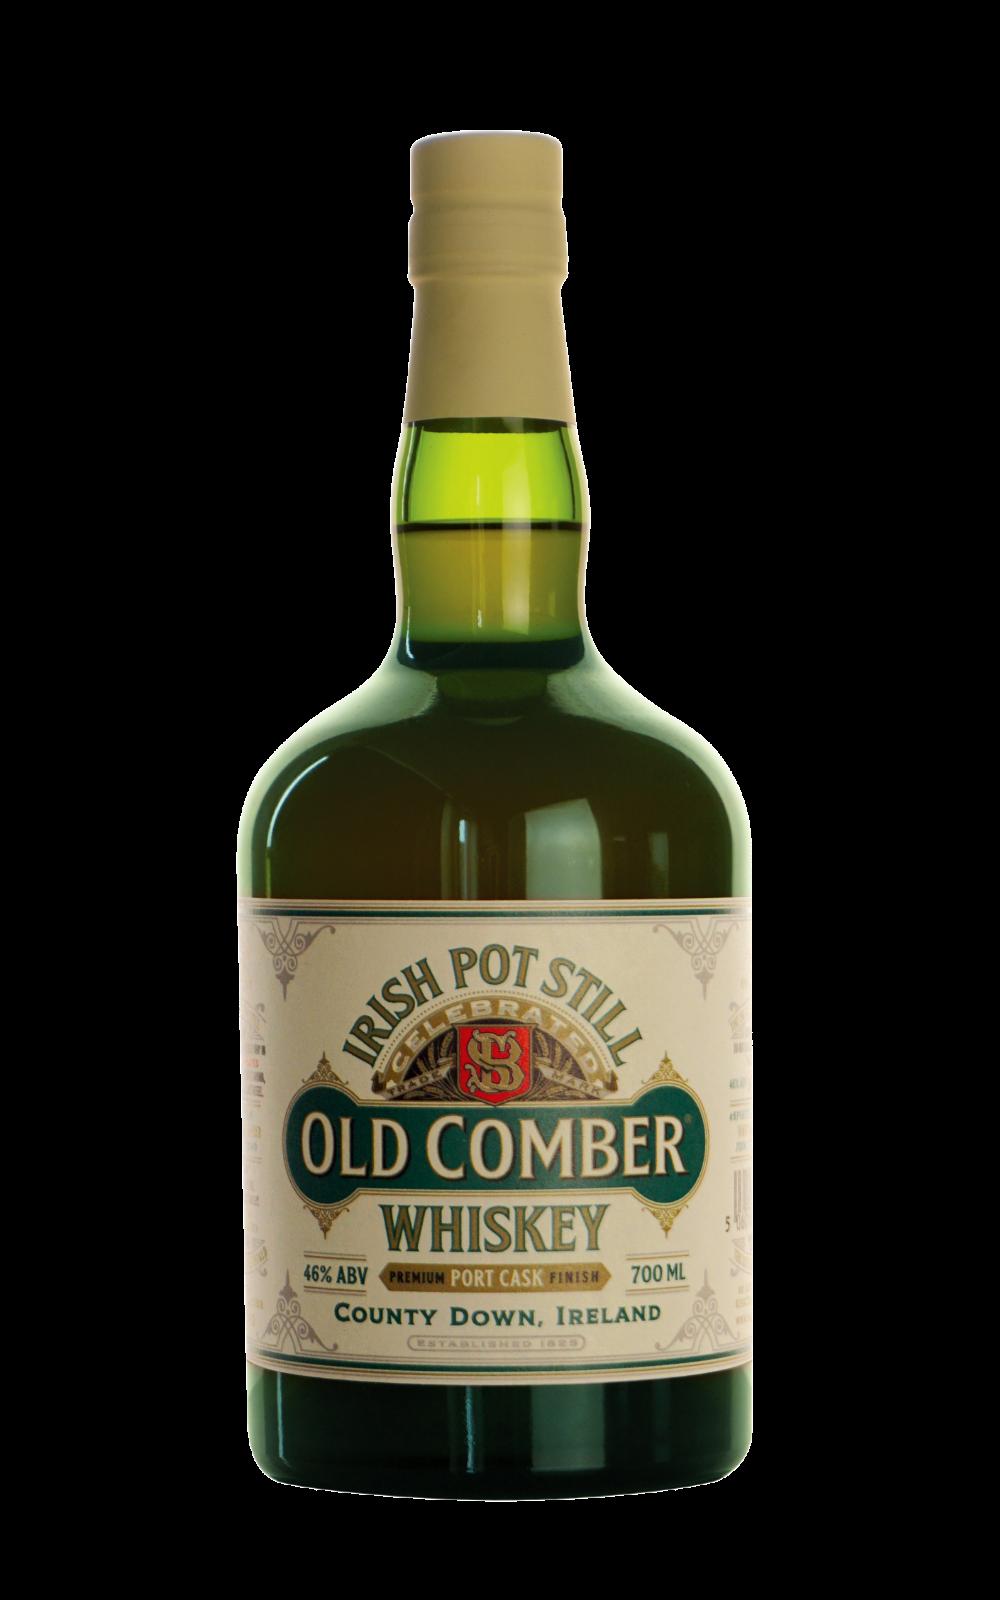 Old Comber Irish Pot St Whiskey bottle